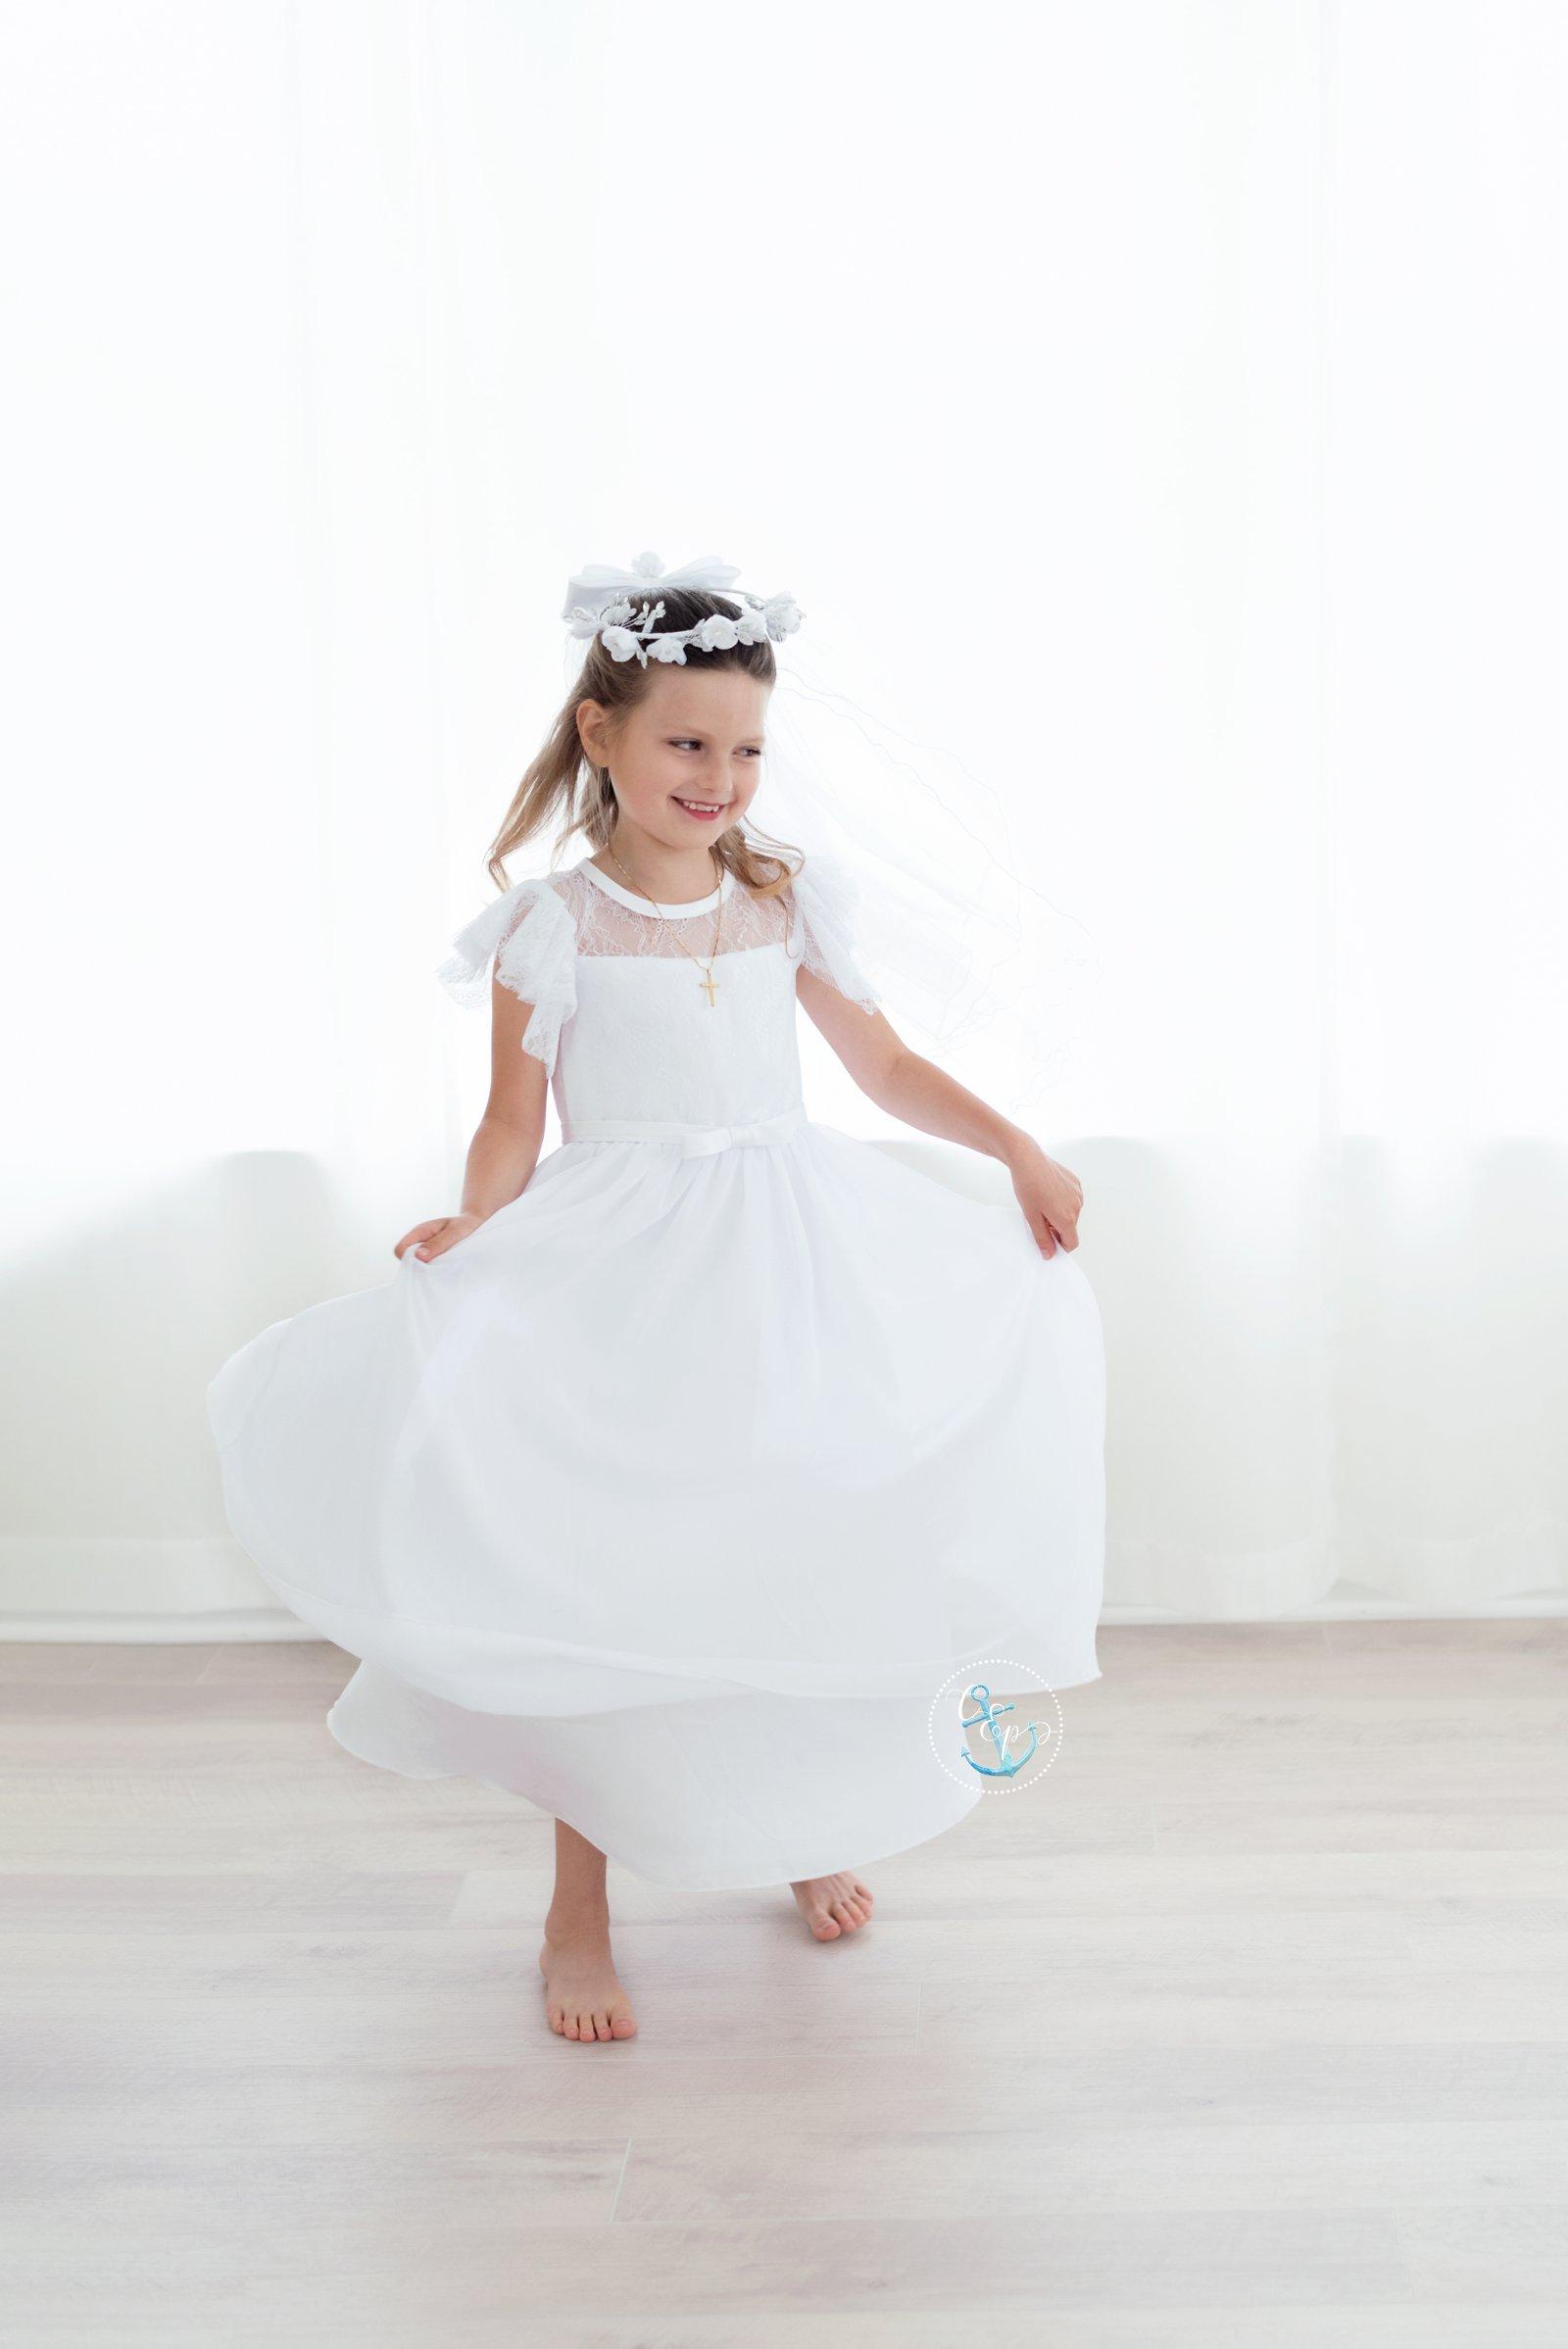 First Communion girl twirling dress, White flower crown, Holy Communion portraits Maryland, Cristina Elisa Photography, white studio portraits